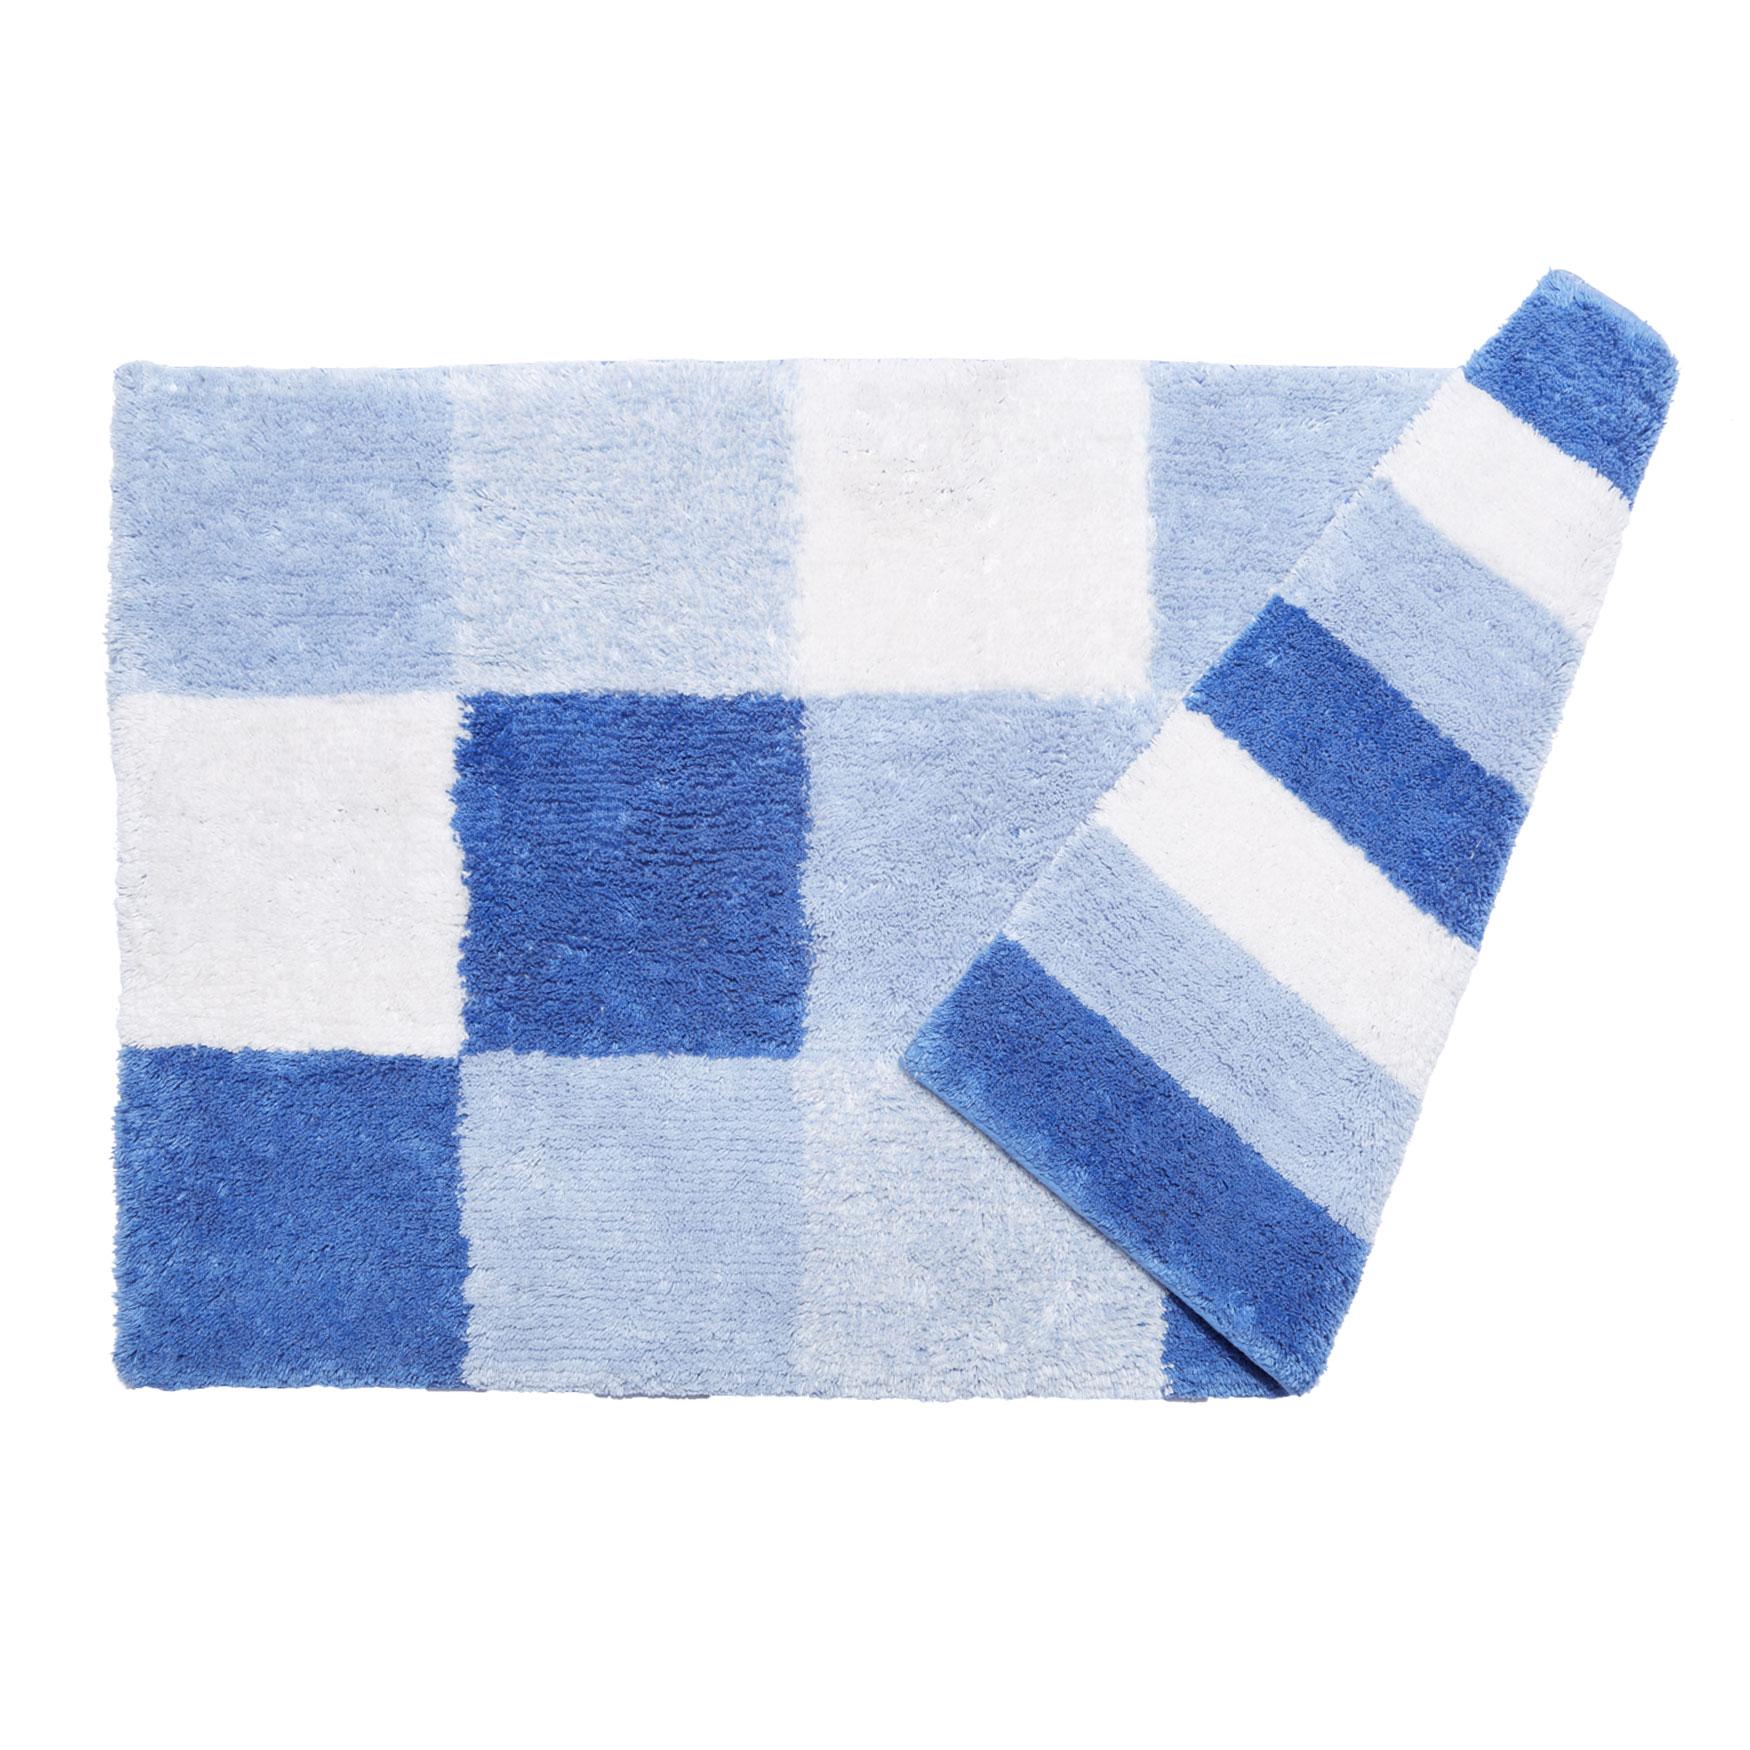 Reversible Bathroom Mats: Colorblock Reversible Bath Rug